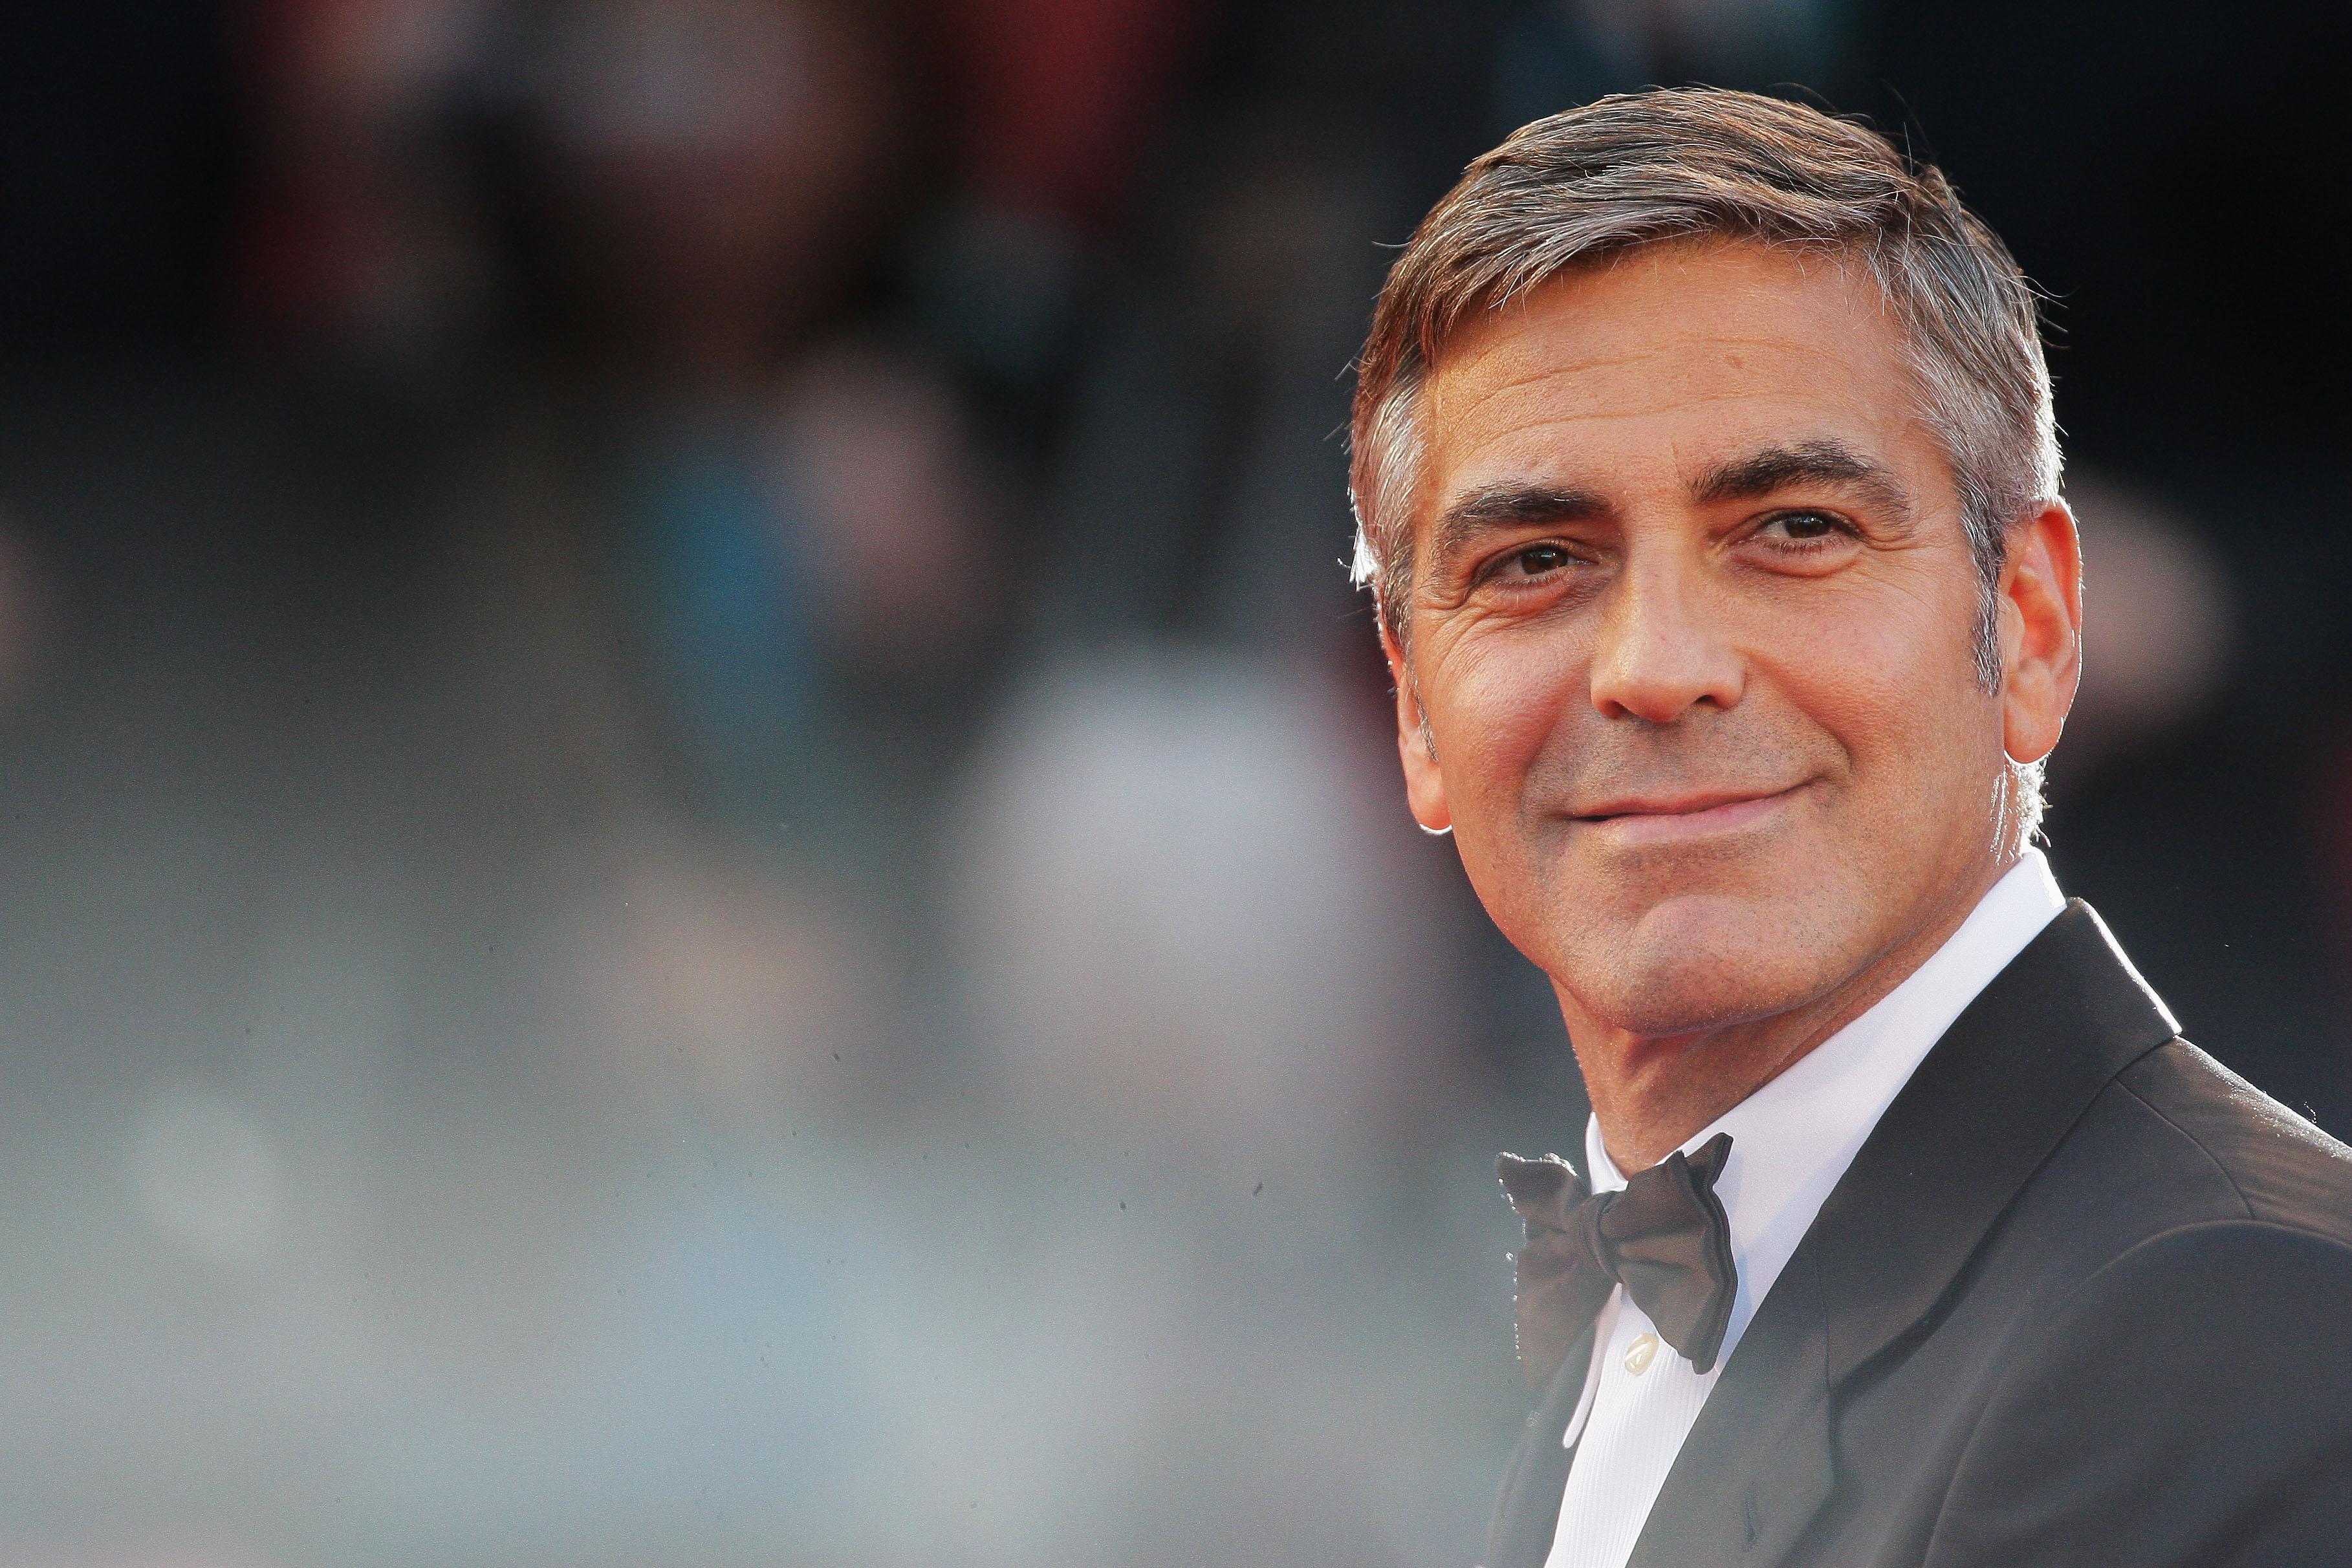 George Clooney (Getty, EH)